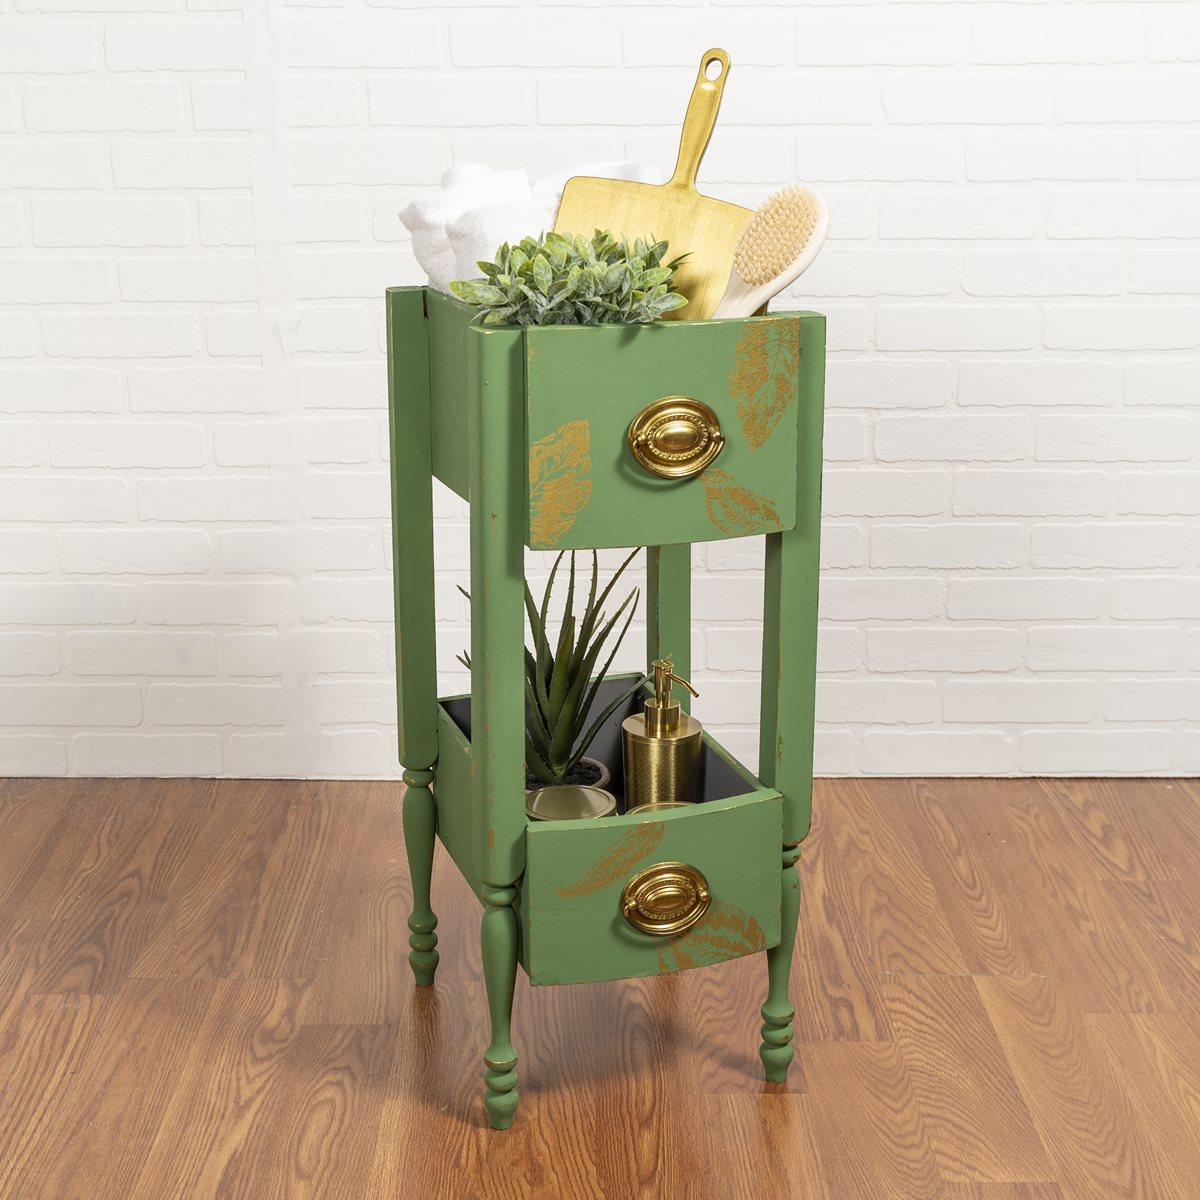 Green Waverly Bathroom Storage Decor